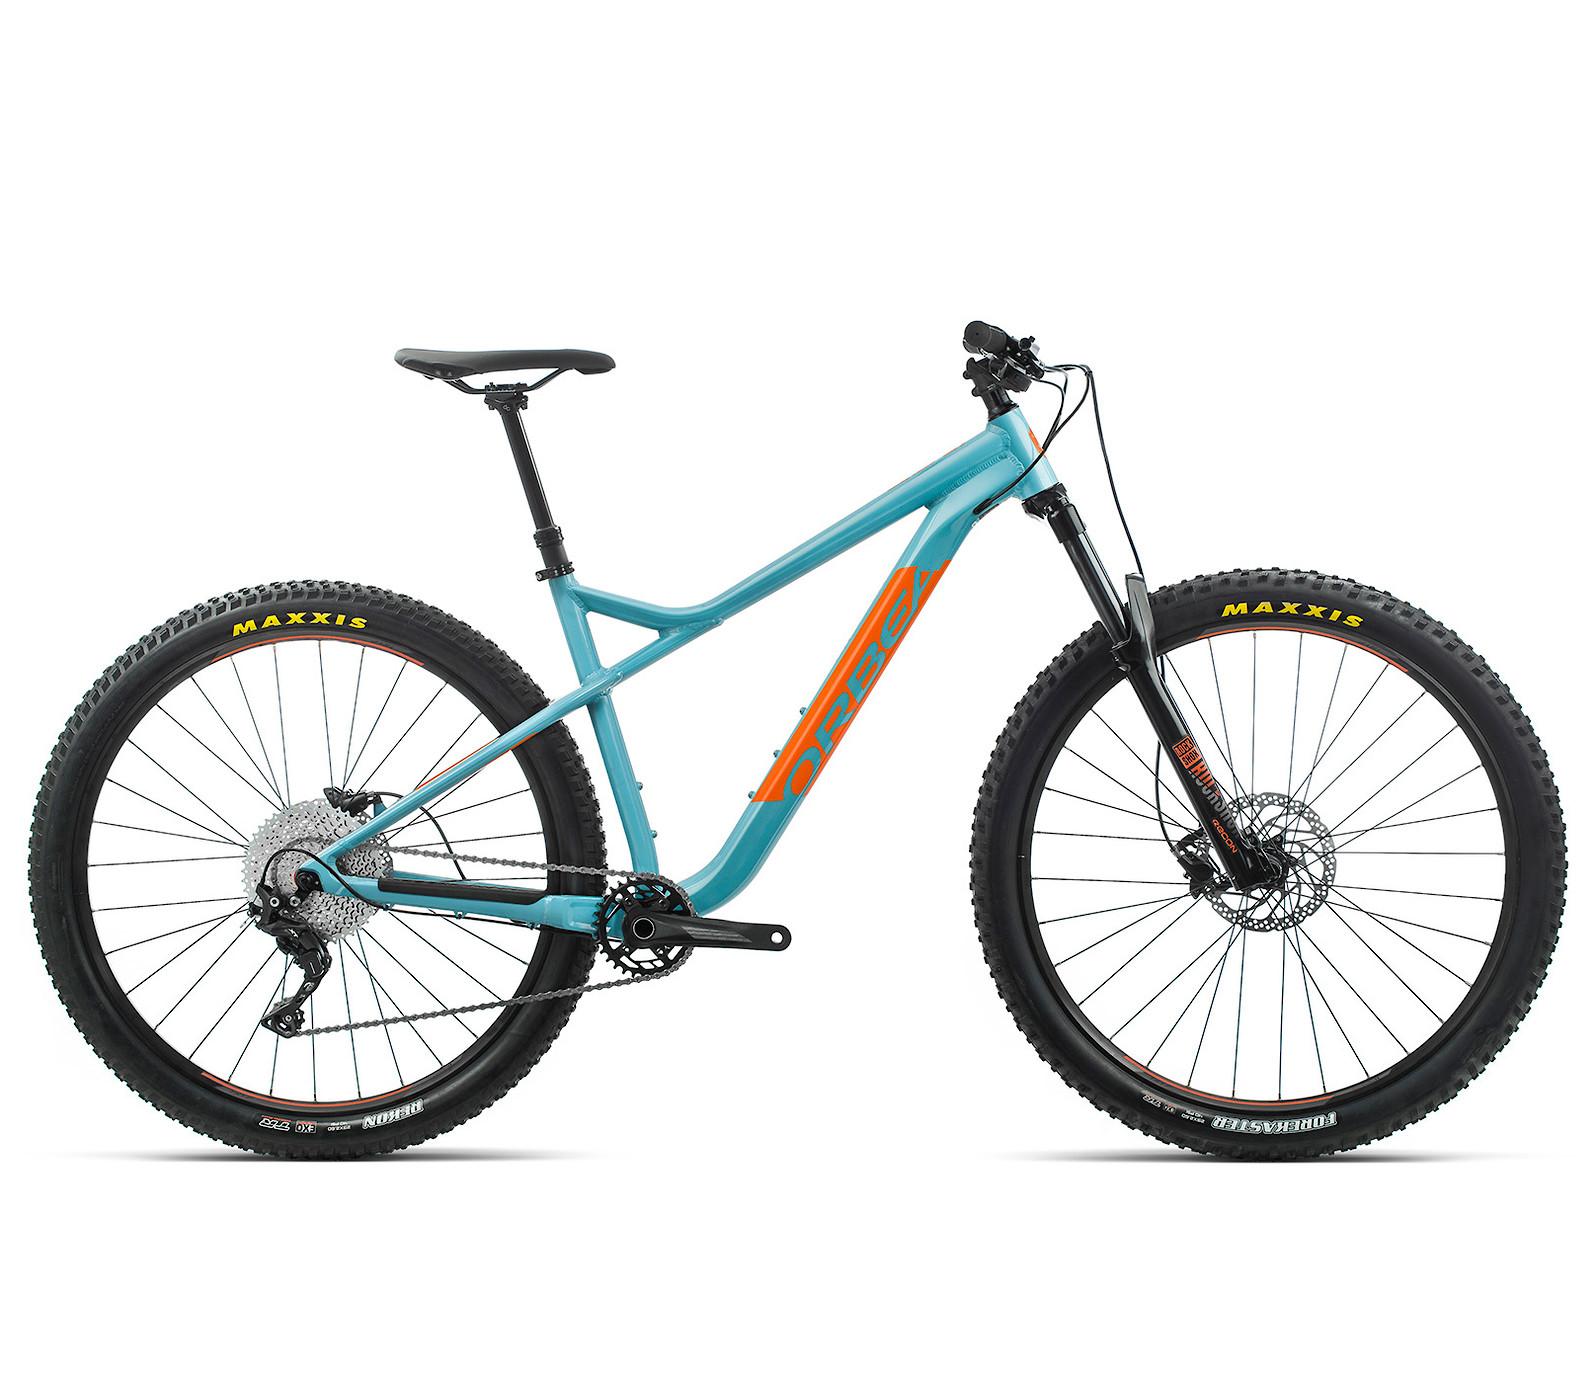 2020 Orbea Laufey H30 in blue gulf/orange